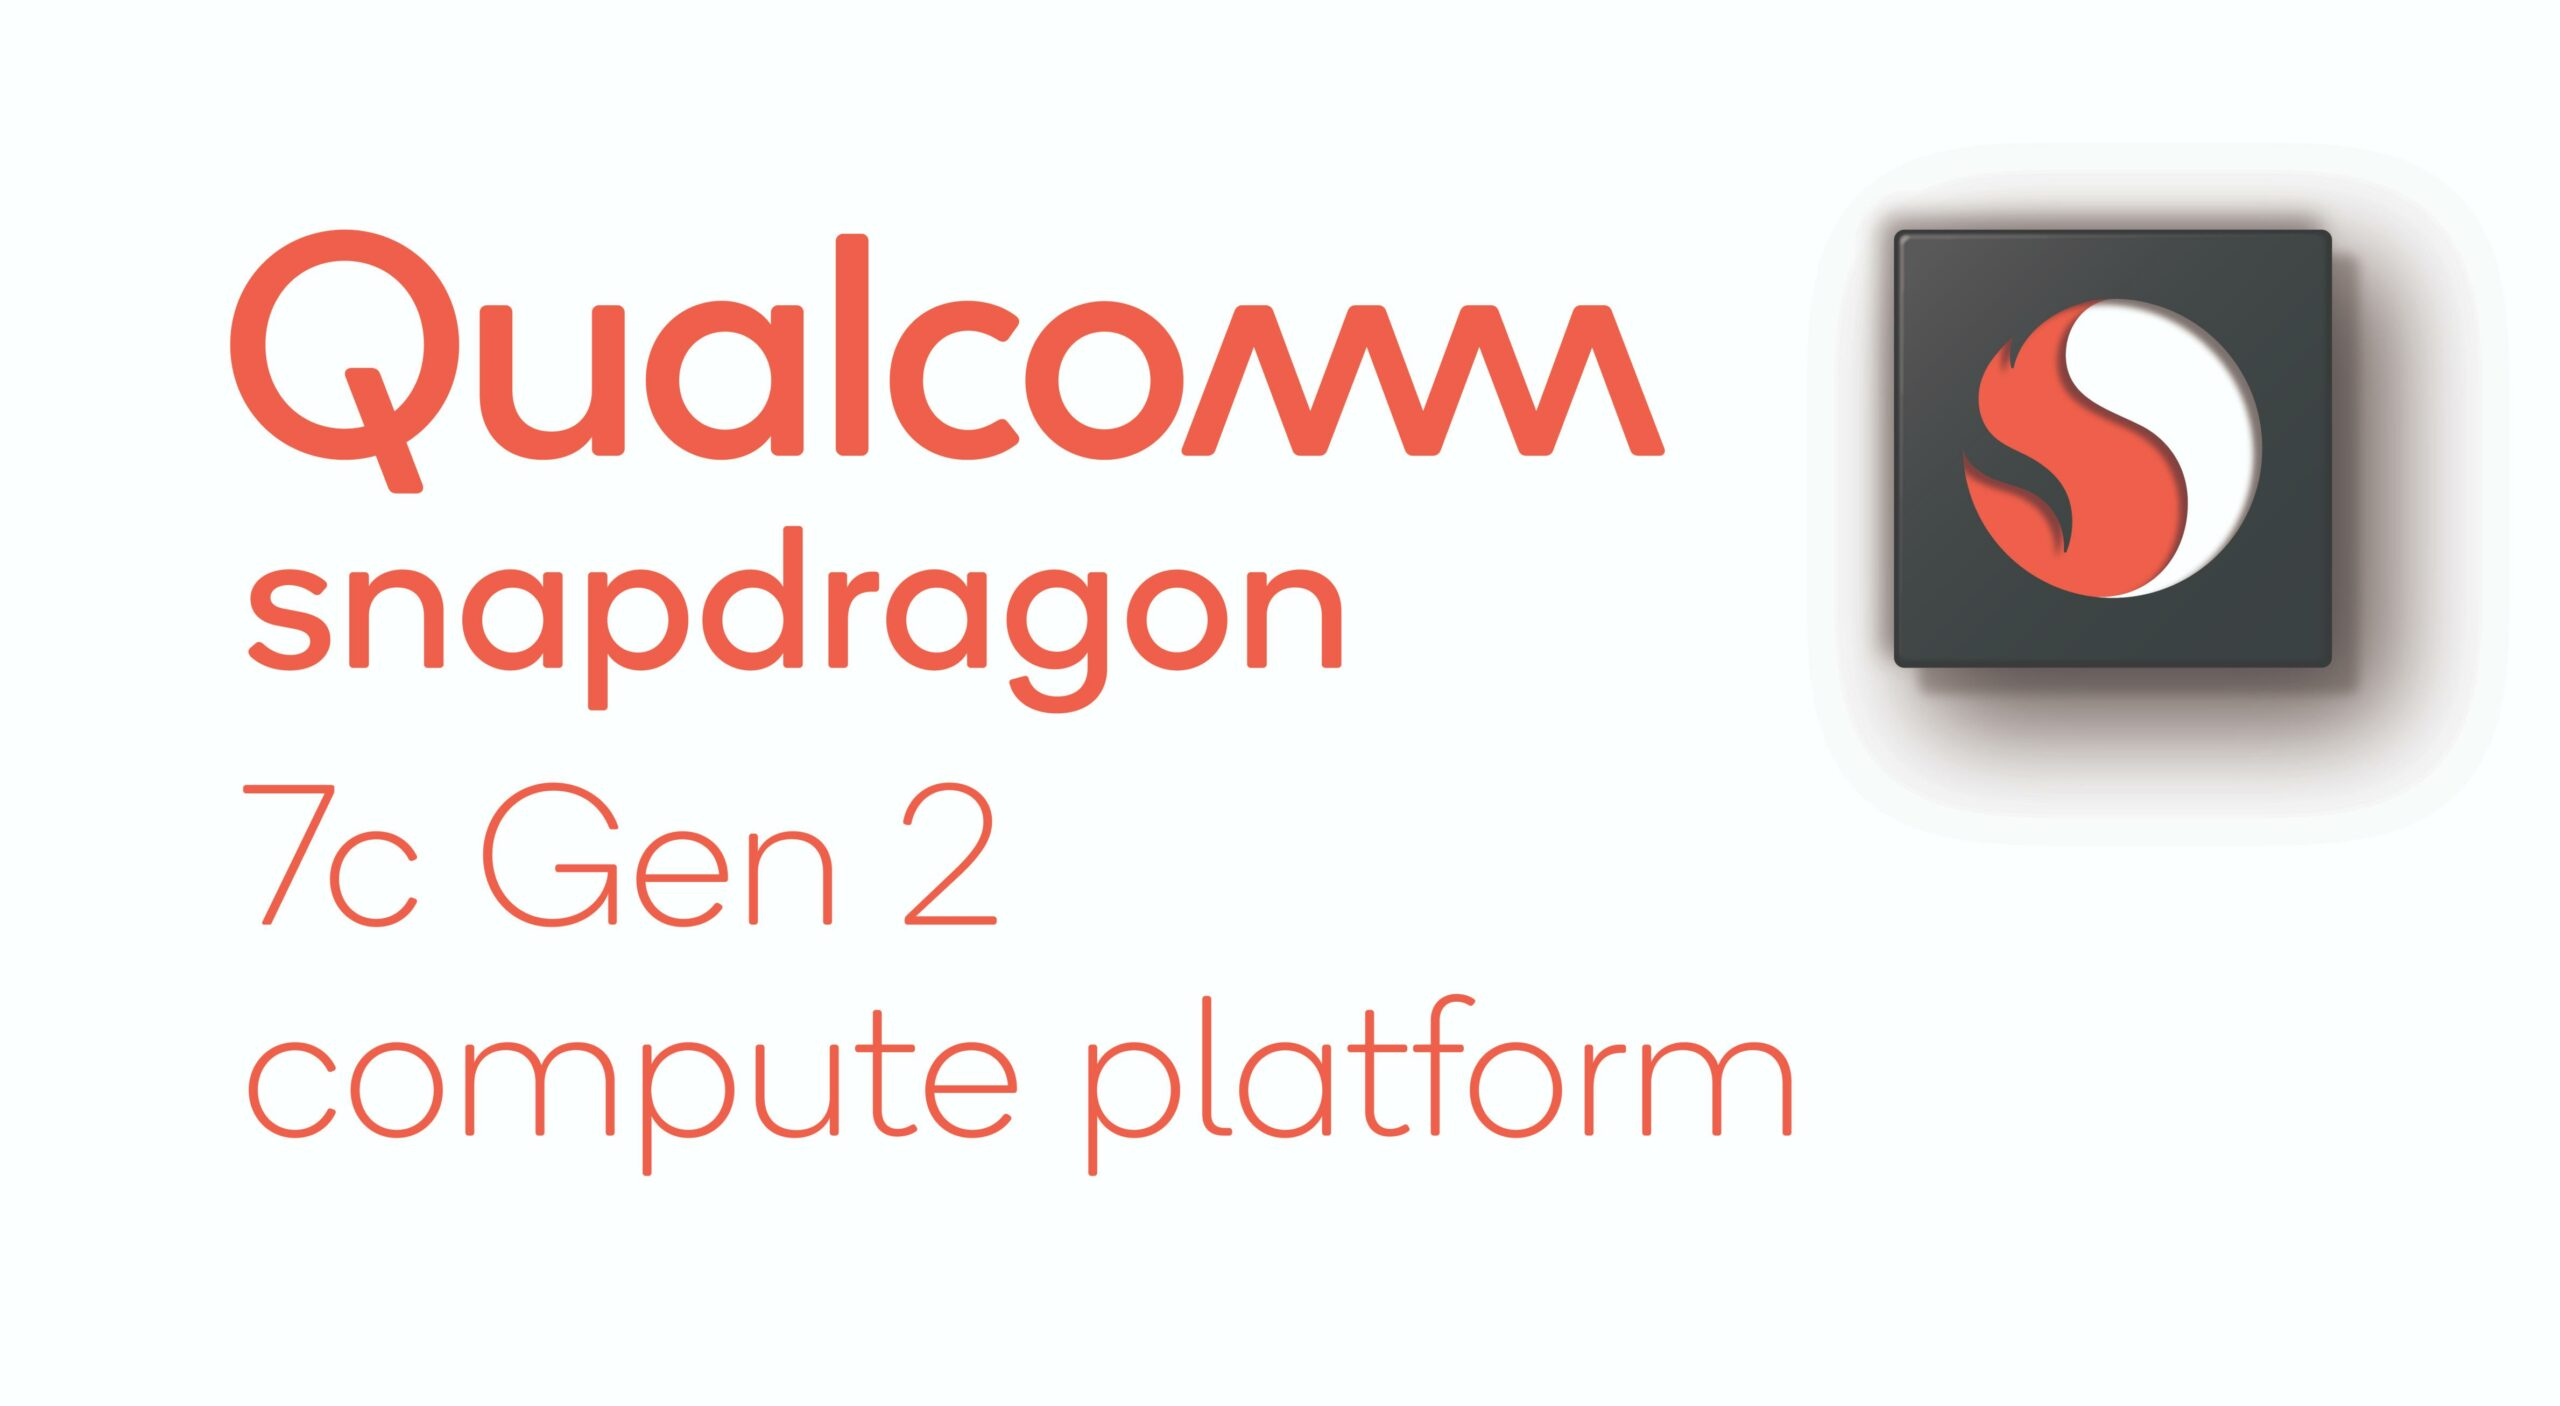 Qualcomm Snapdragon 7c Gen 2 launched for basic Windows Laptops, Chromebooks